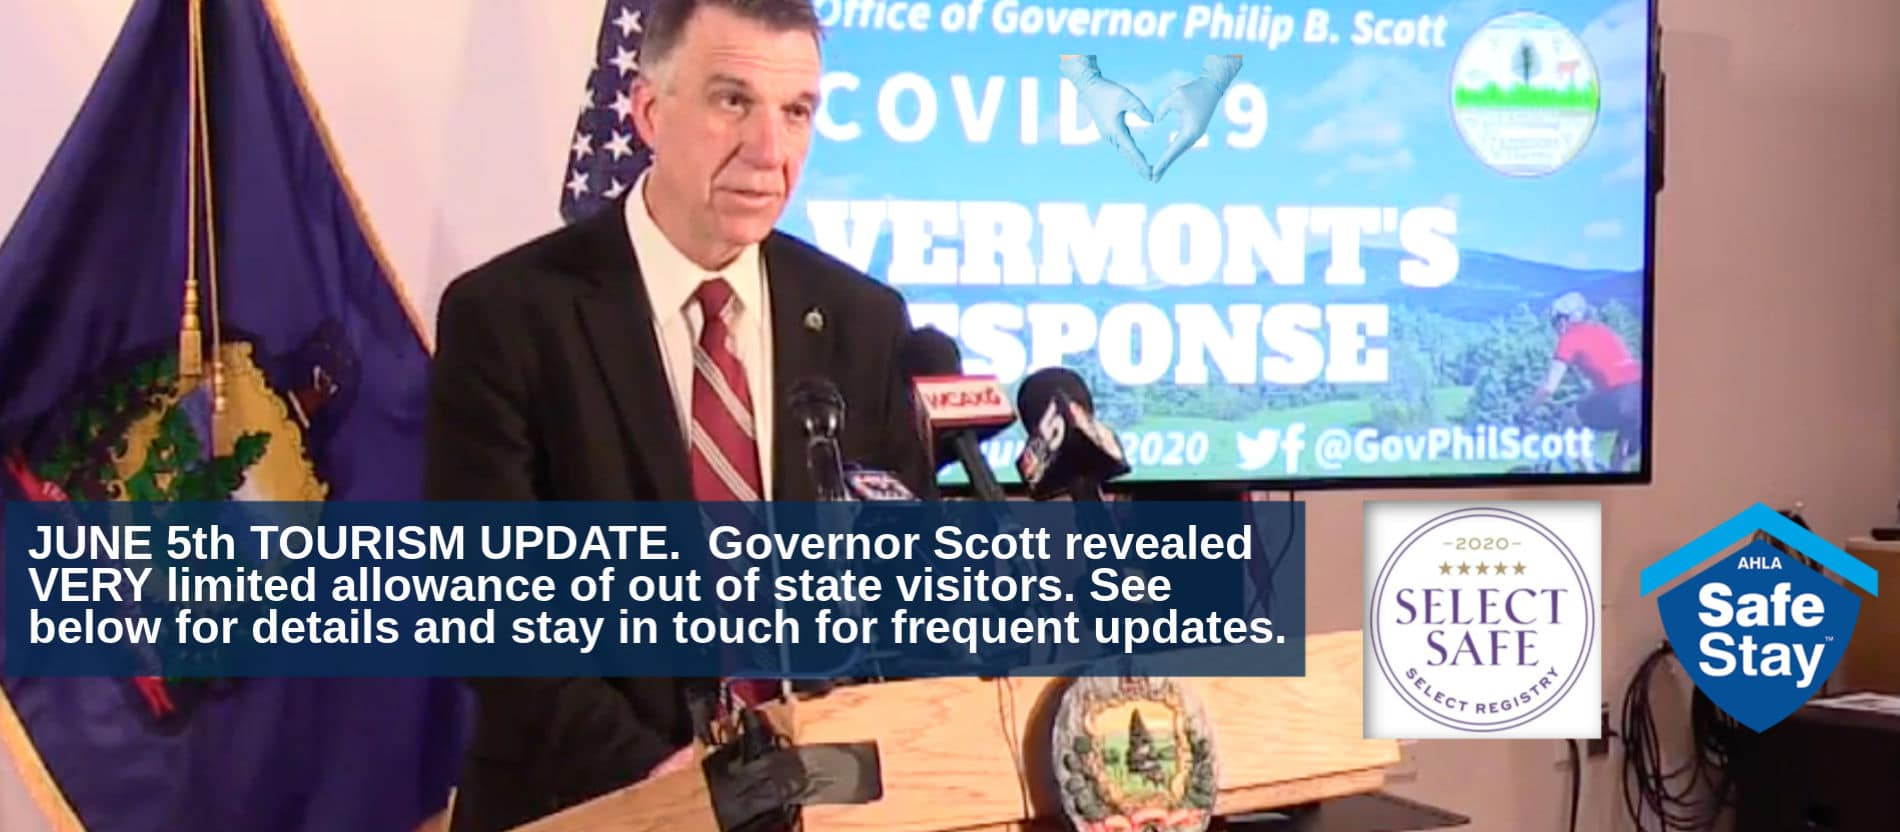 Vermont Governor Phil Scott